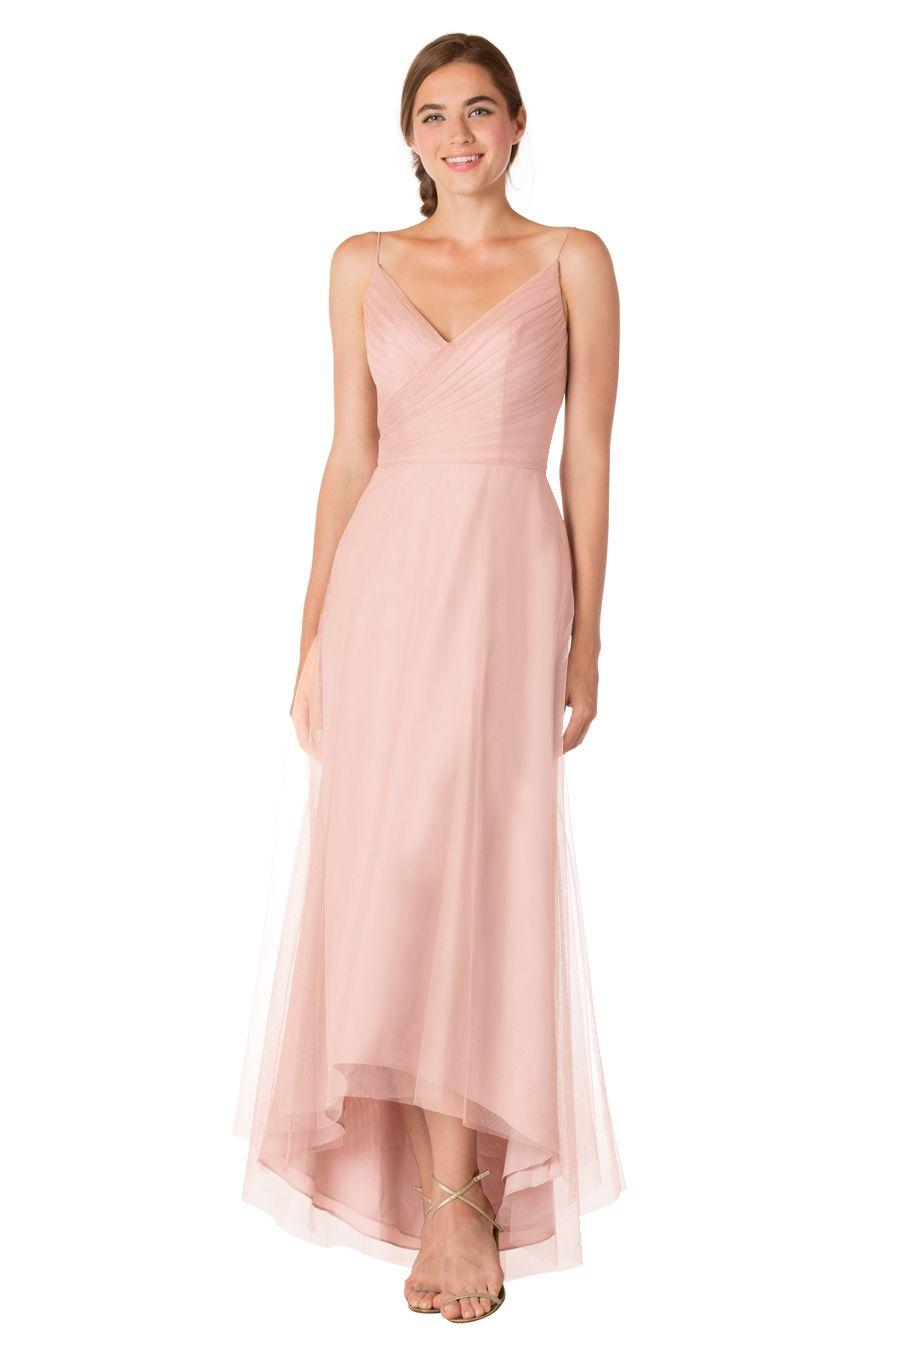 Bari Jay Bridesmaid dress | Style EN-1714 | Spring 2017 | Swing into ...